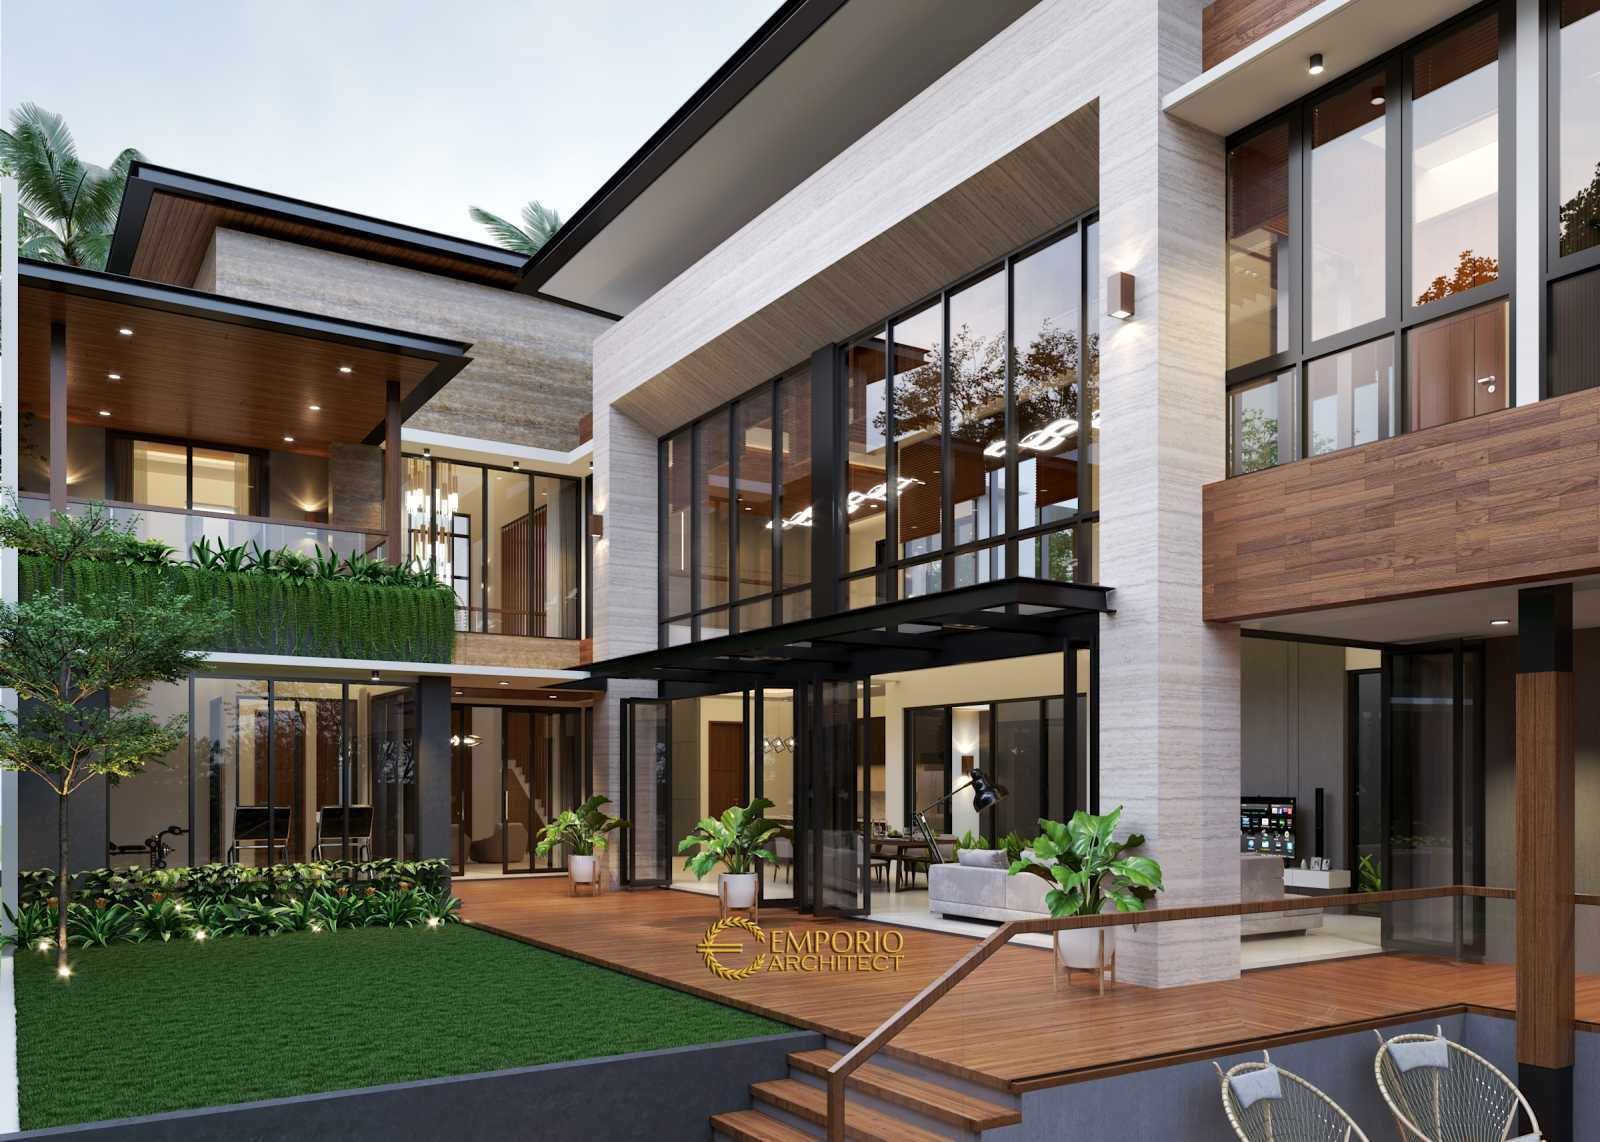 Emporio Architect Jasa Arsitek Jakarta Desain Rumah Modern Tropis 639 @ Jakarta Jakarta, Daerah Khusus Ibukota Jakarta, Indonesia Jakarta, Daerah Khusus Ibukota Jakarta, Indonesia Emporio-Architect-Jasa-Arsitek-Jakarta-Desain-Rumah-Modern-Tropis-639-Jakarta   83074